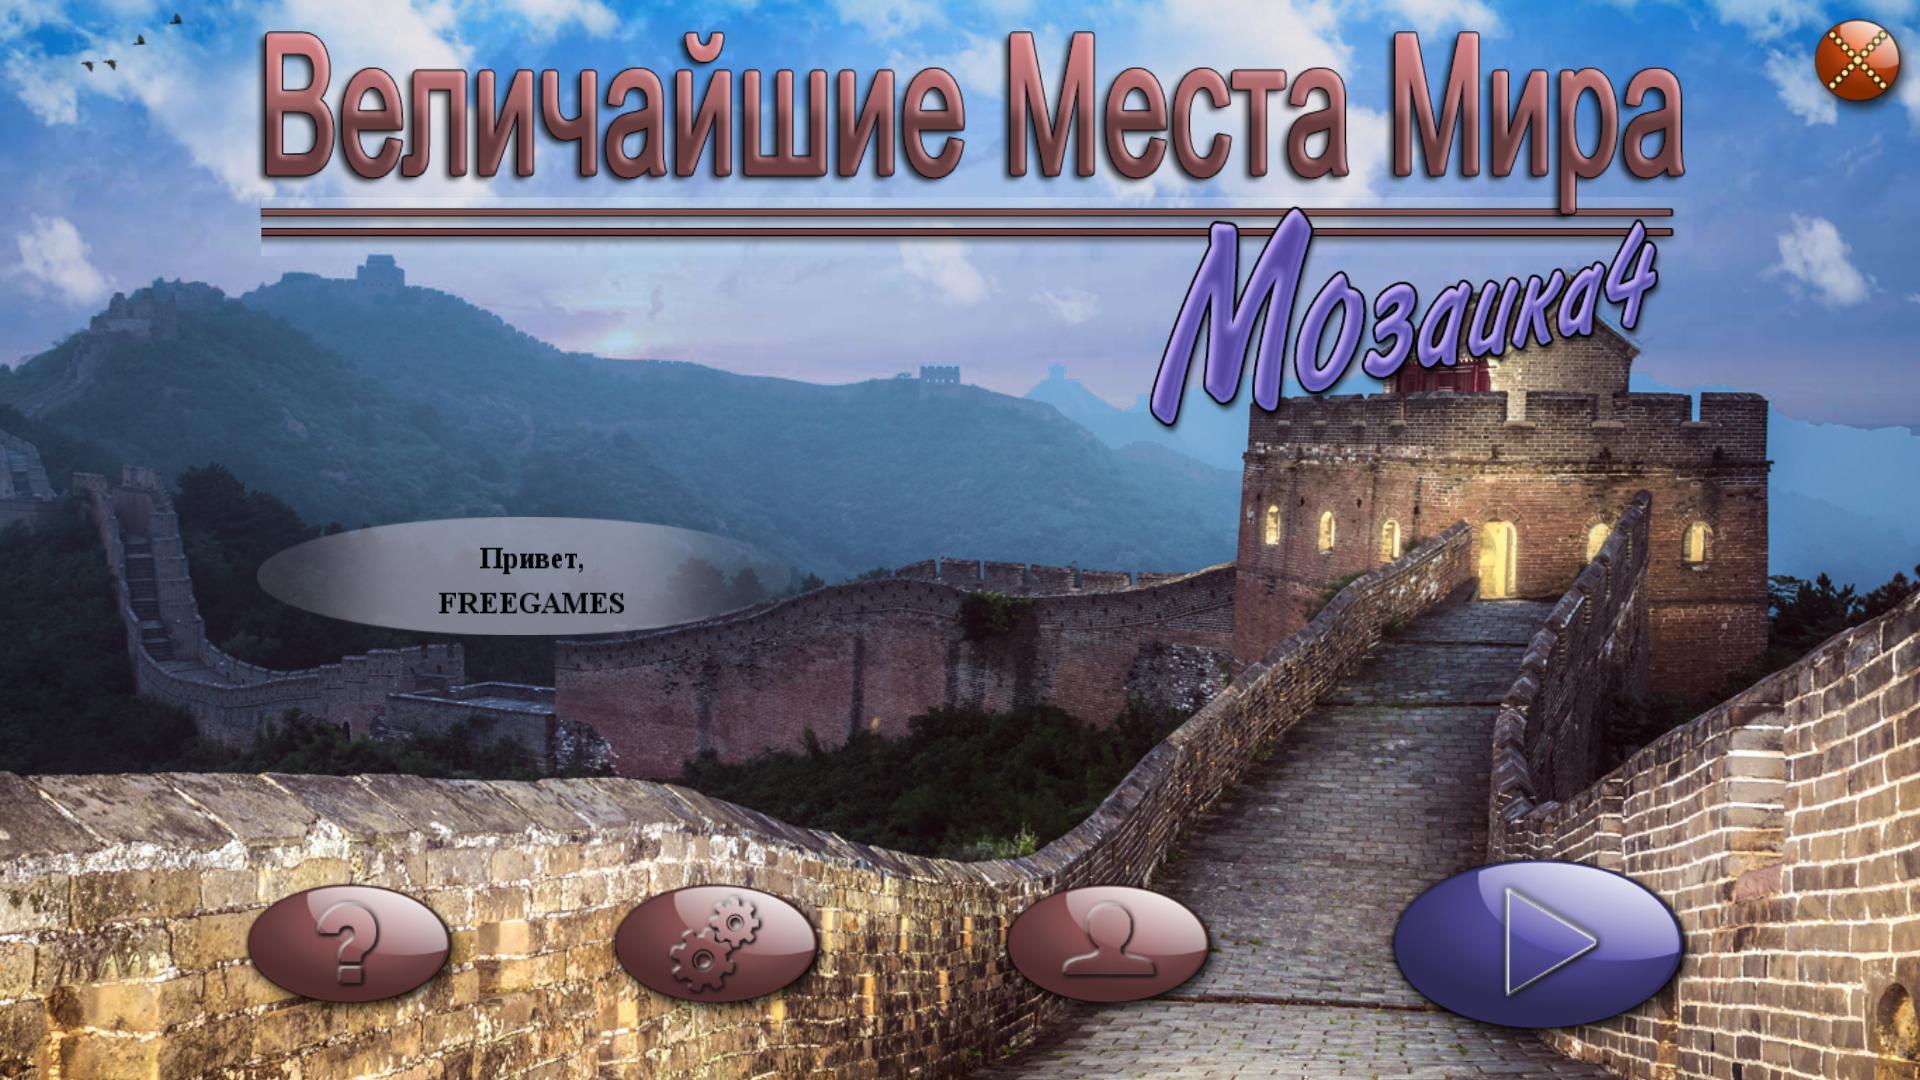 Величайшие места мира. Мозаика 4   World's Greatest Places Mosaics 4 (Rus)